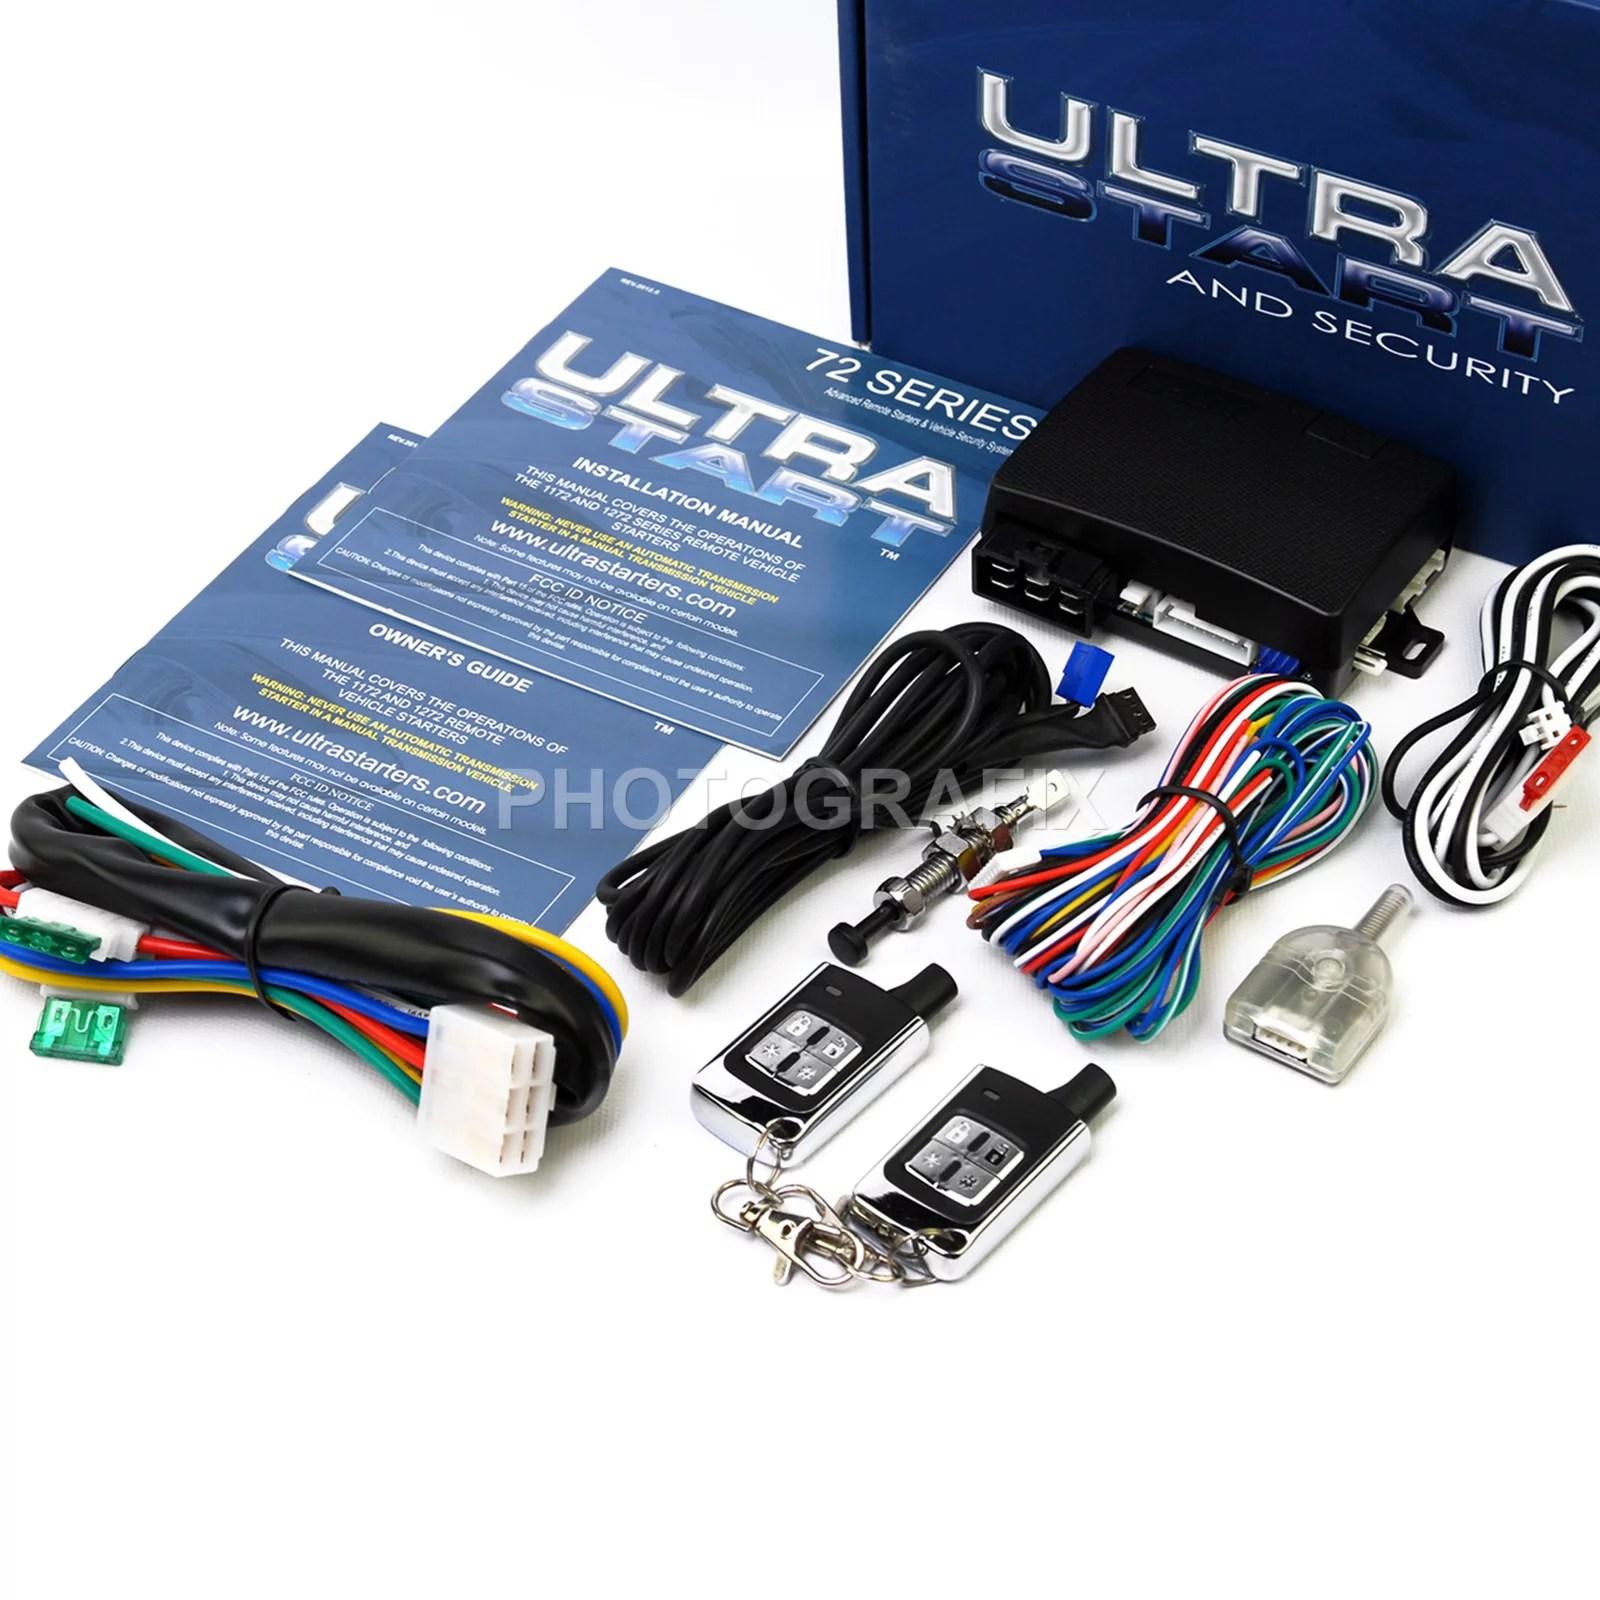 small resolution of ultra start 1272 xr pro keyless auto remote car start starter diagrams start wiring remote oltrastart